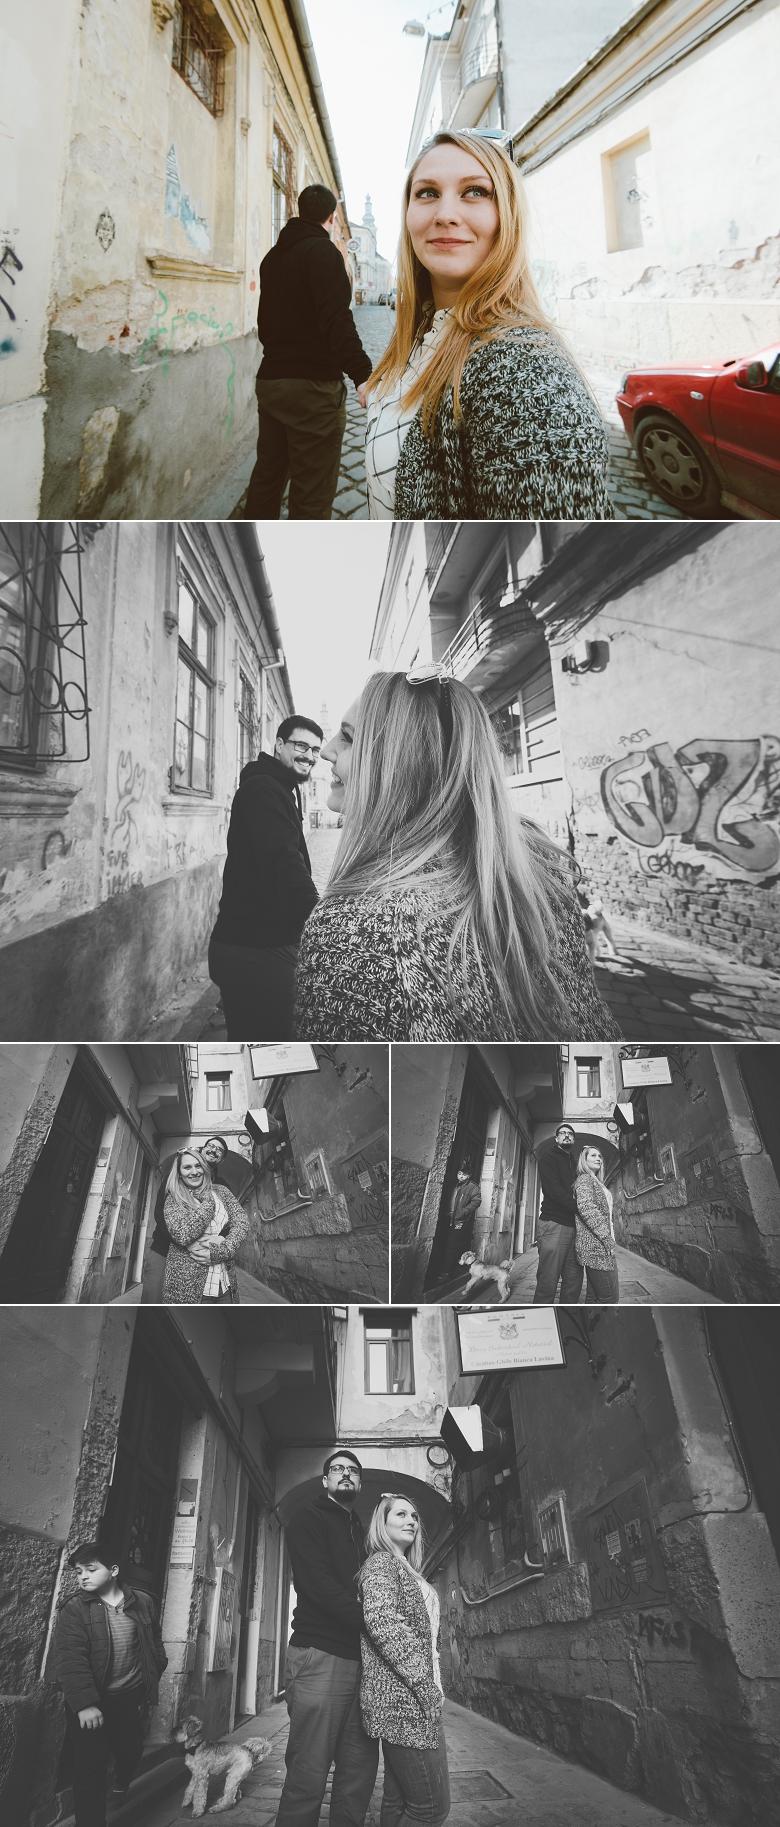 sedinta_foto_save_the_date_cluj_poze_pre_wedding_cluj 13